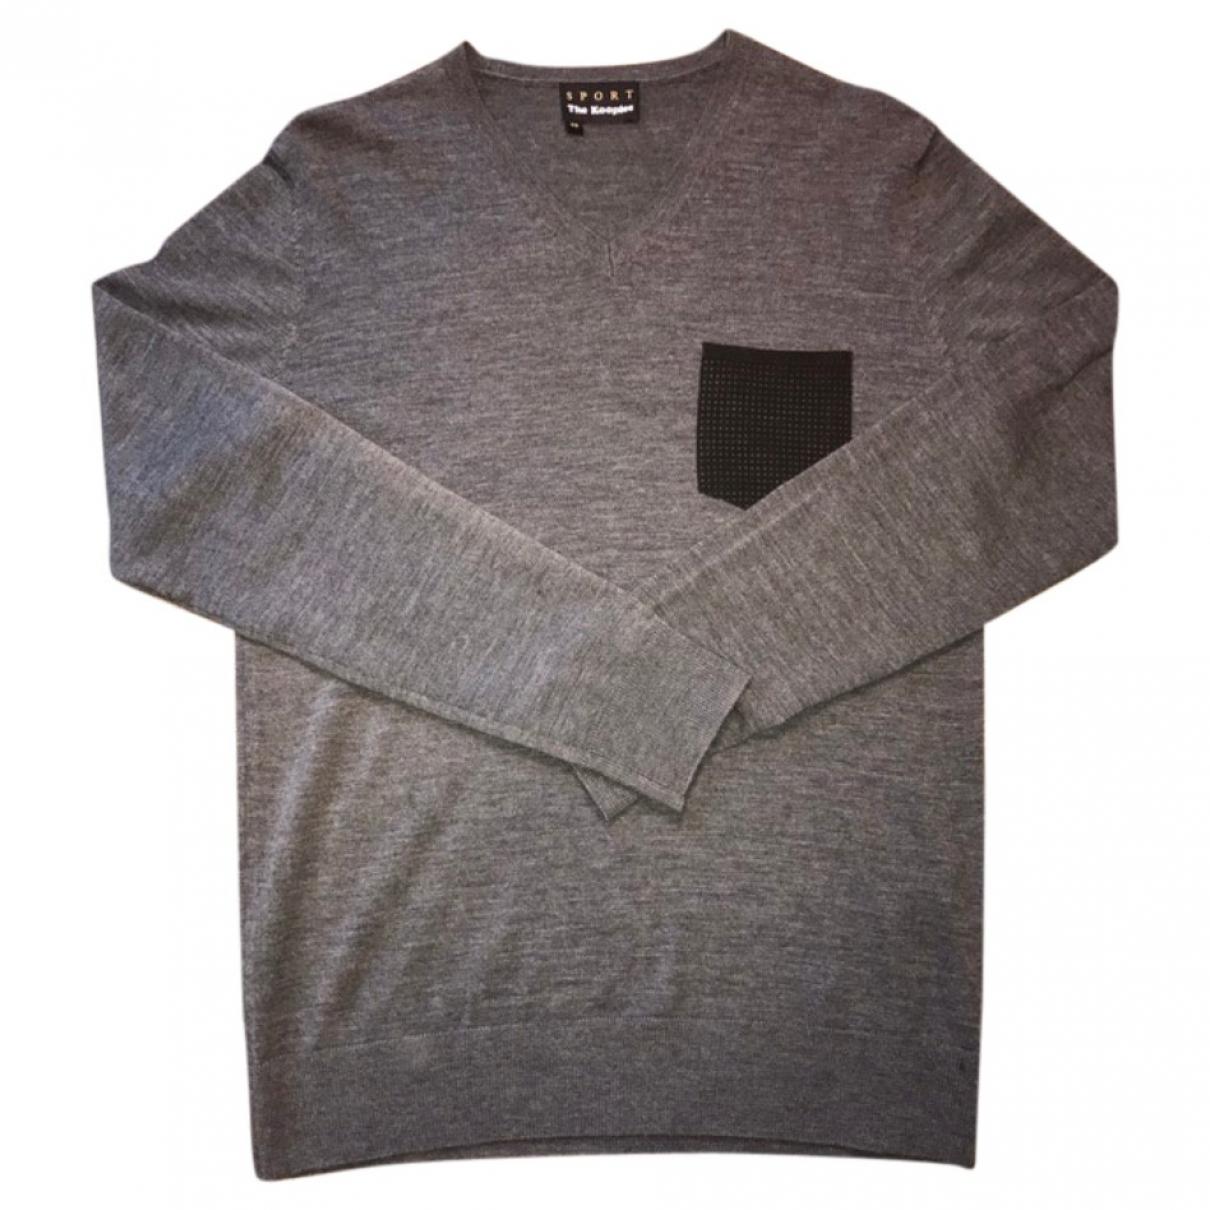 The Kooples \N Anthracite Wool Knitwear & Sweatshirts for Men XS International